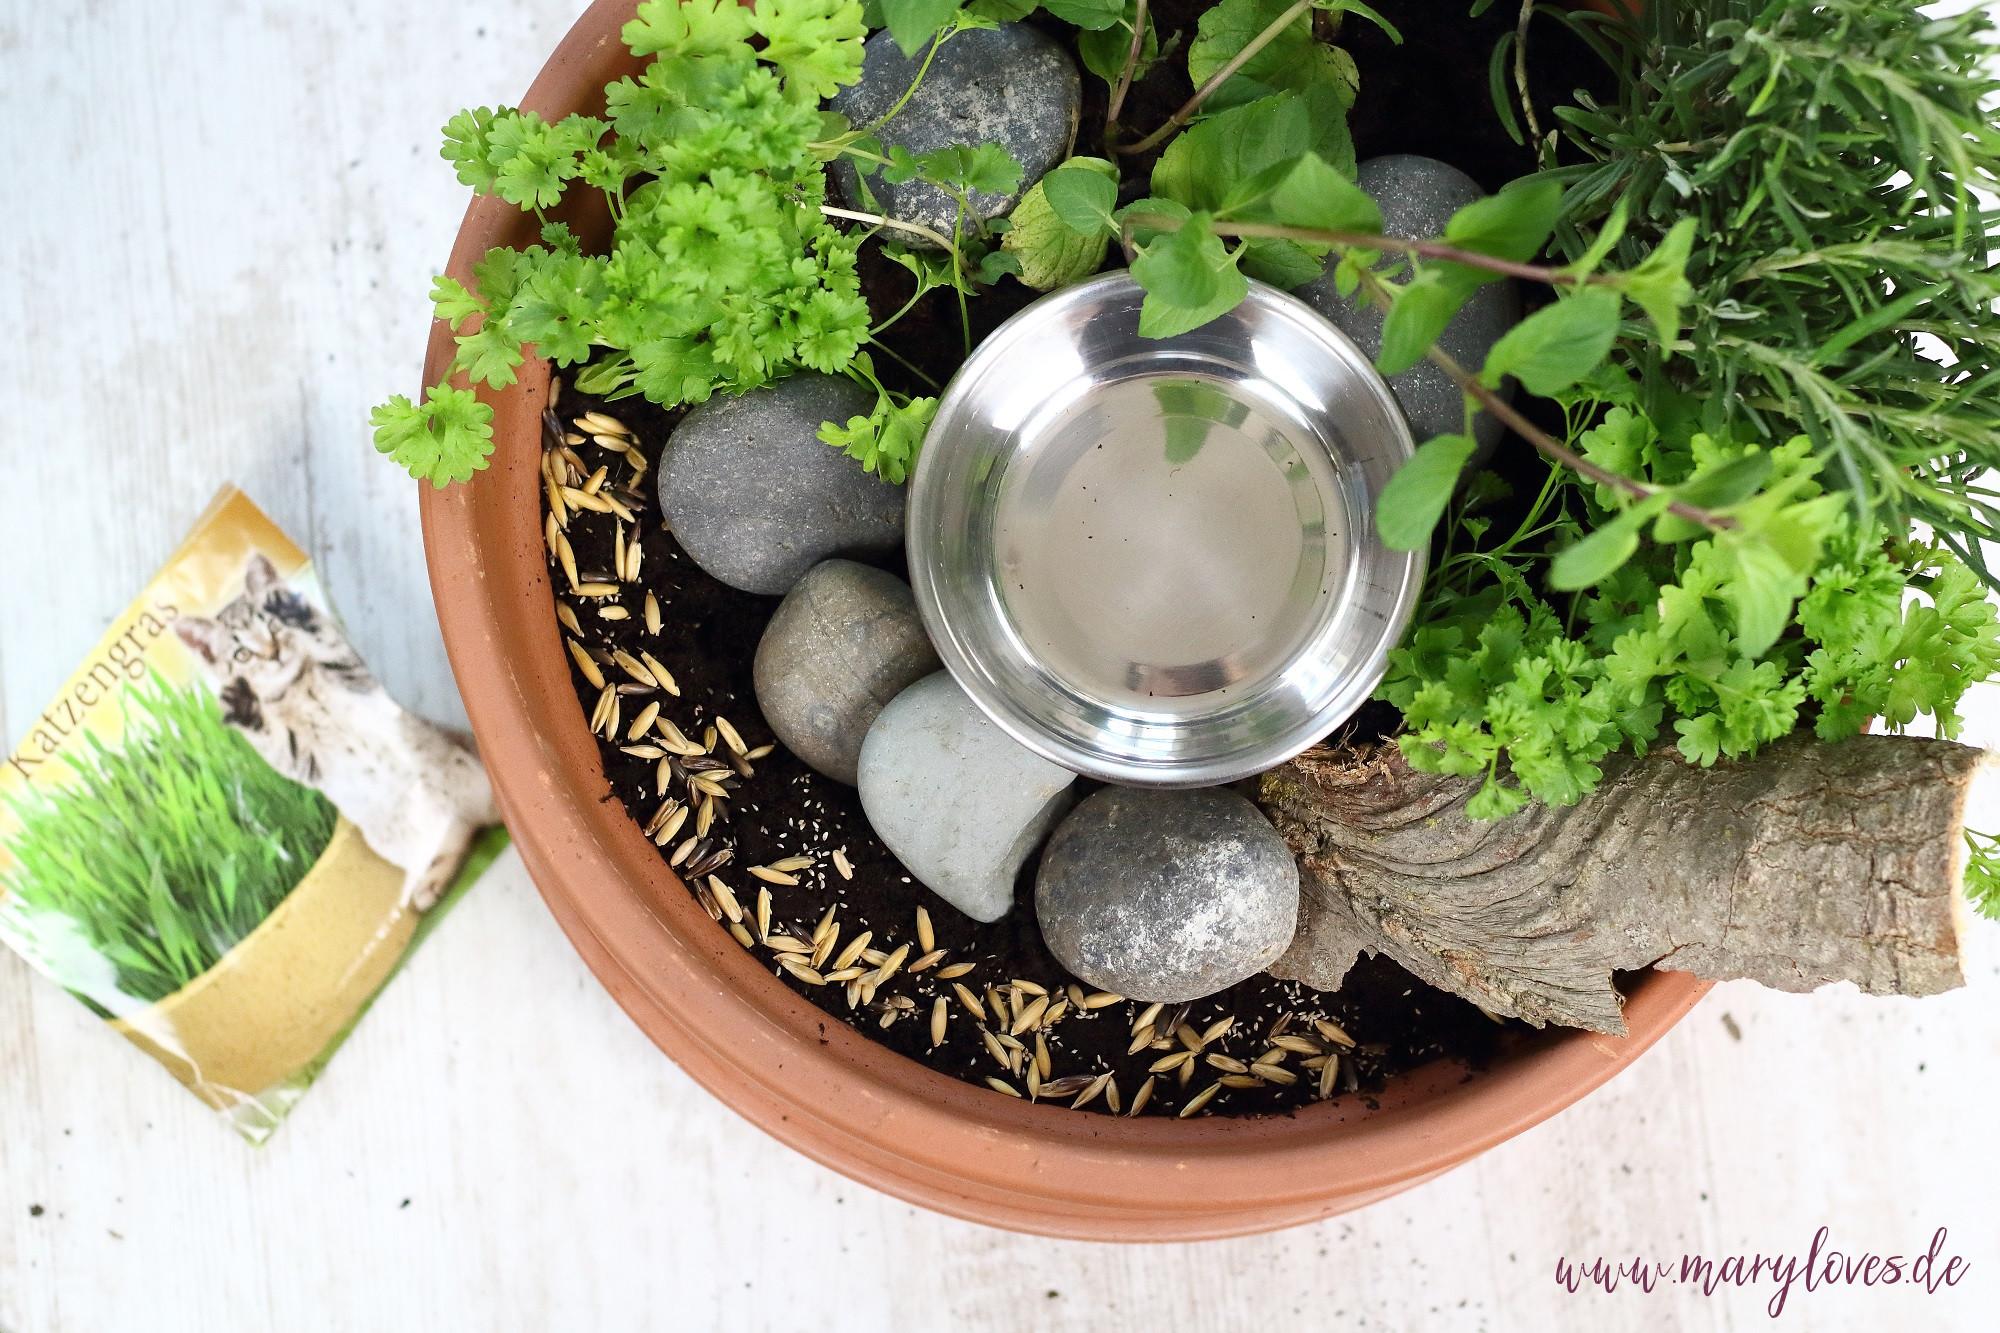 Anleitung zum selbstgebauten Katzenkräutergarten